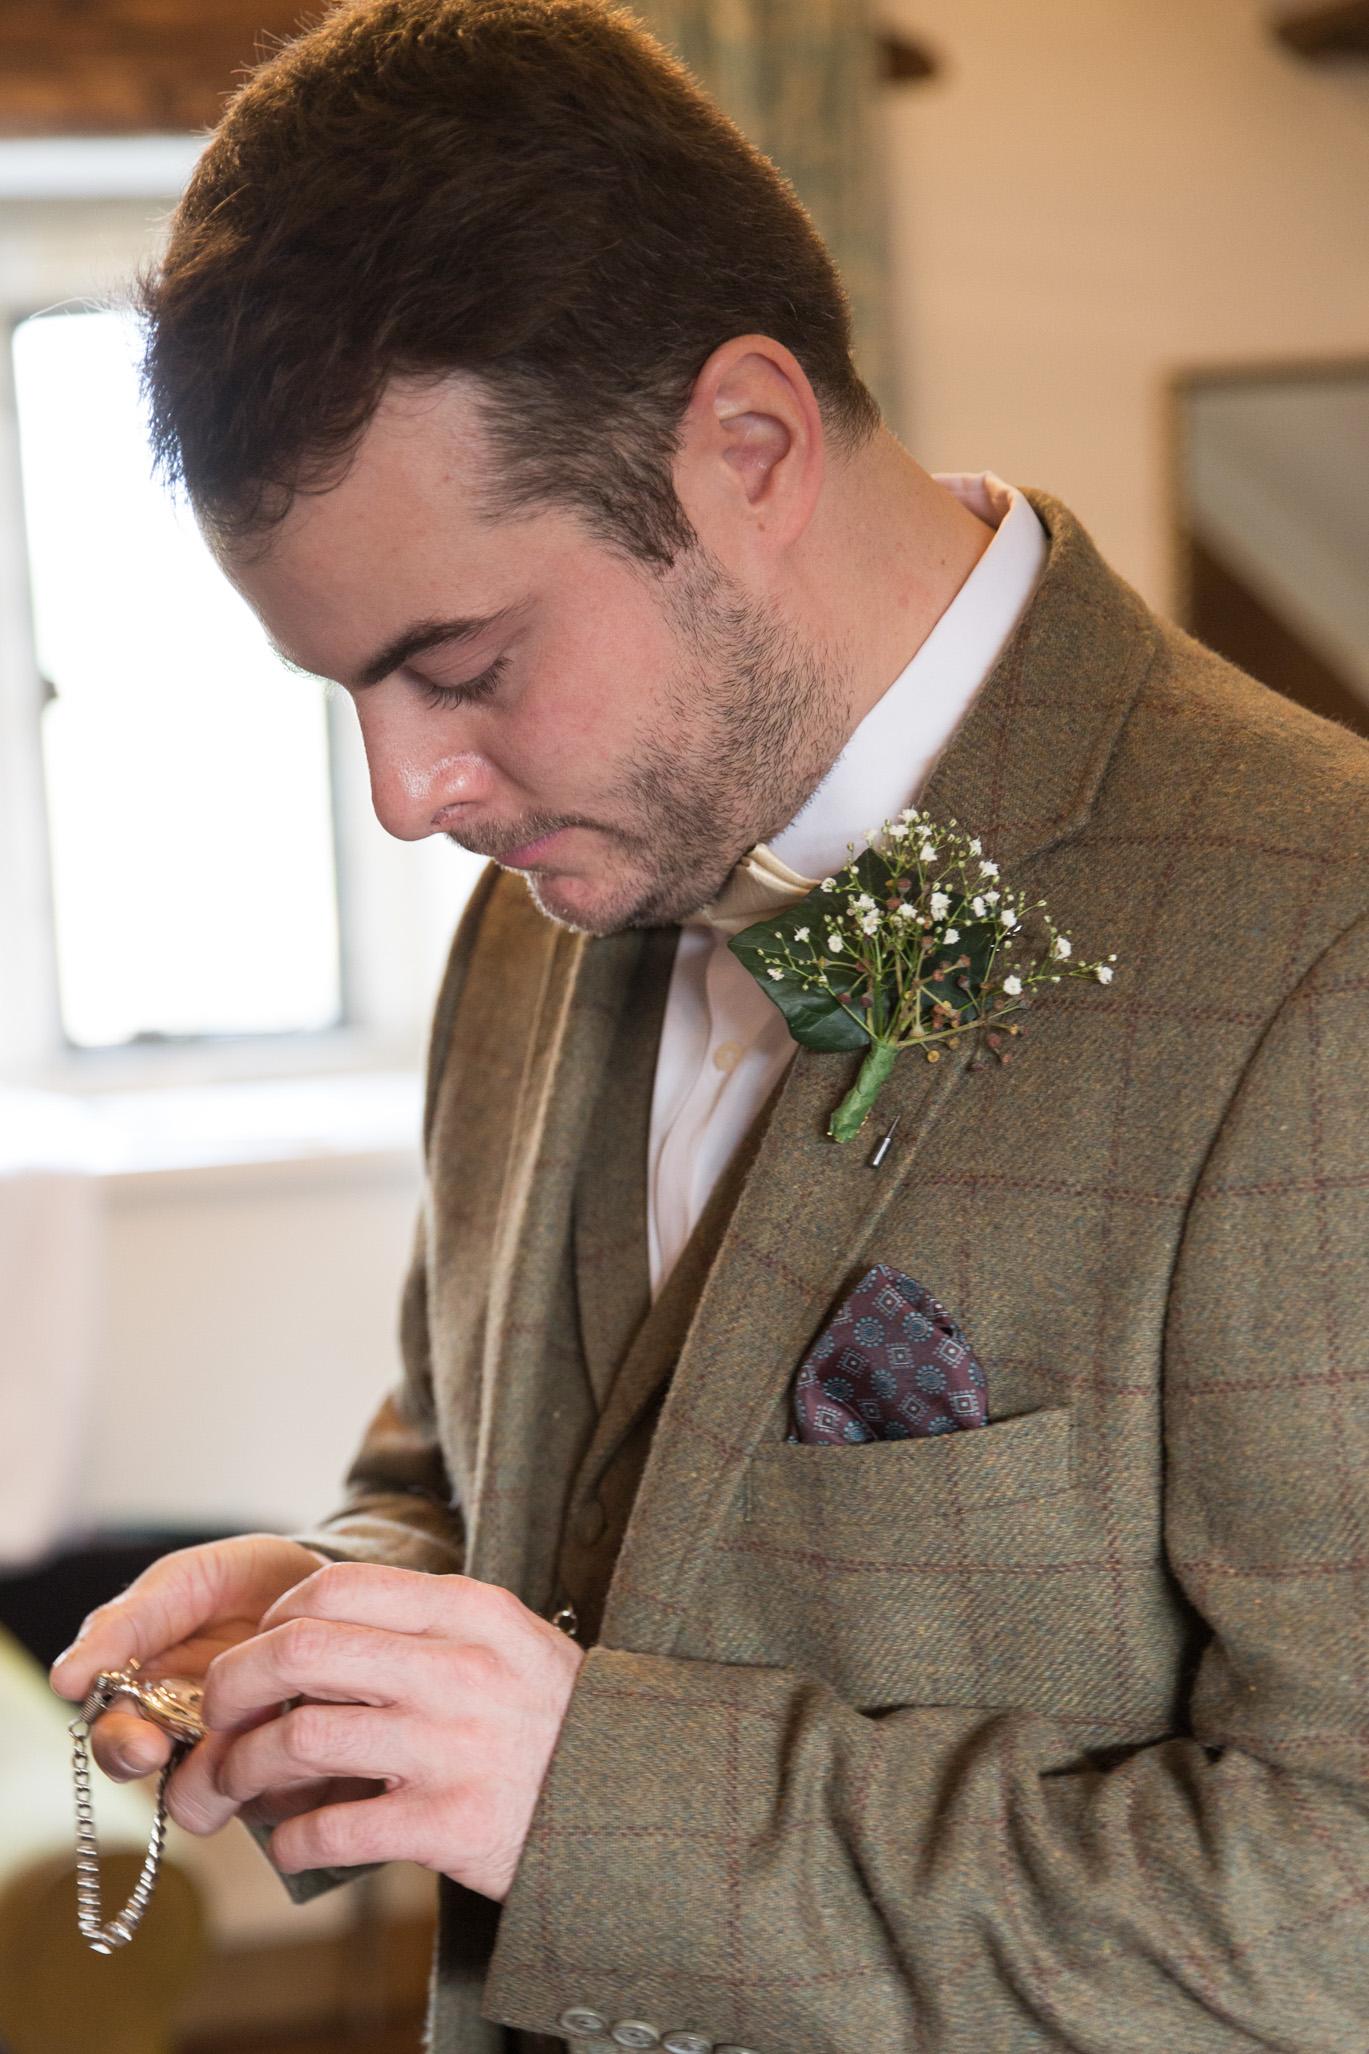 Jess & Ben - Bristol Wedding Photographer - Wright Wedding Photography - 33